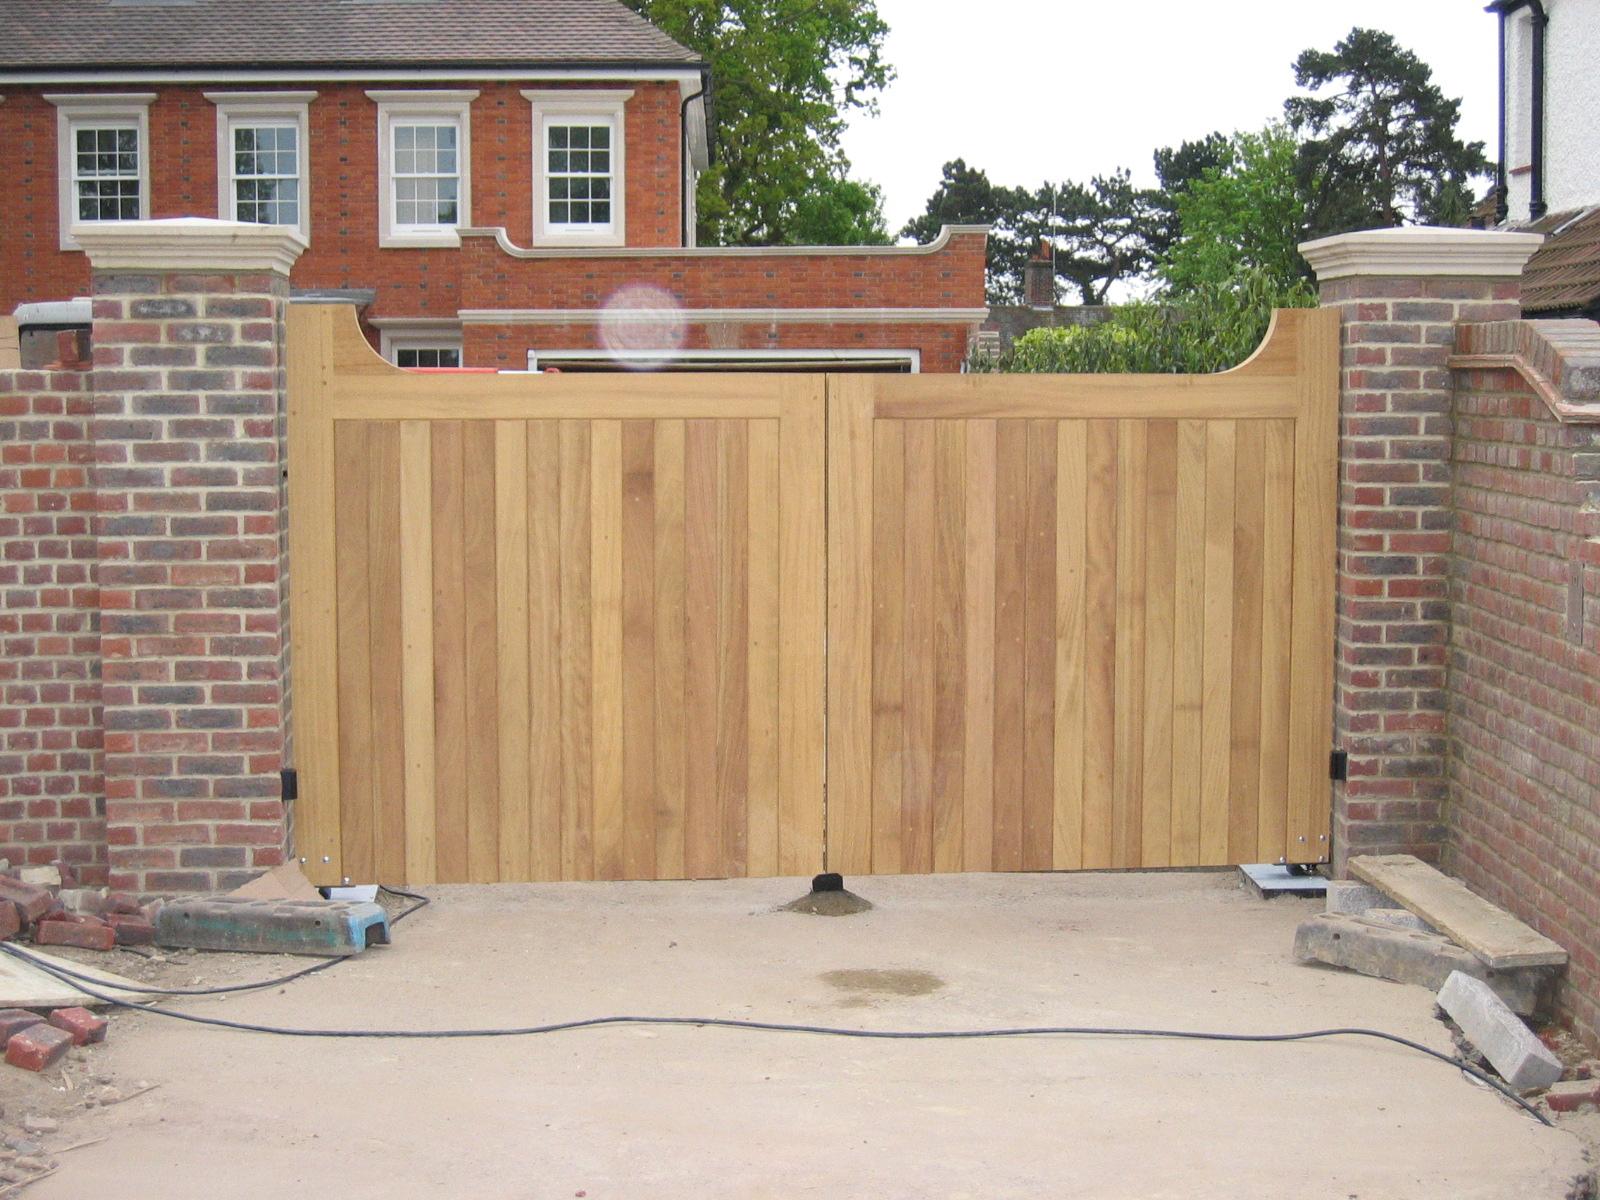 outside house decorations wooden gate designs ideas. Black Bedroom Furniture Sets. Home Design Ideas